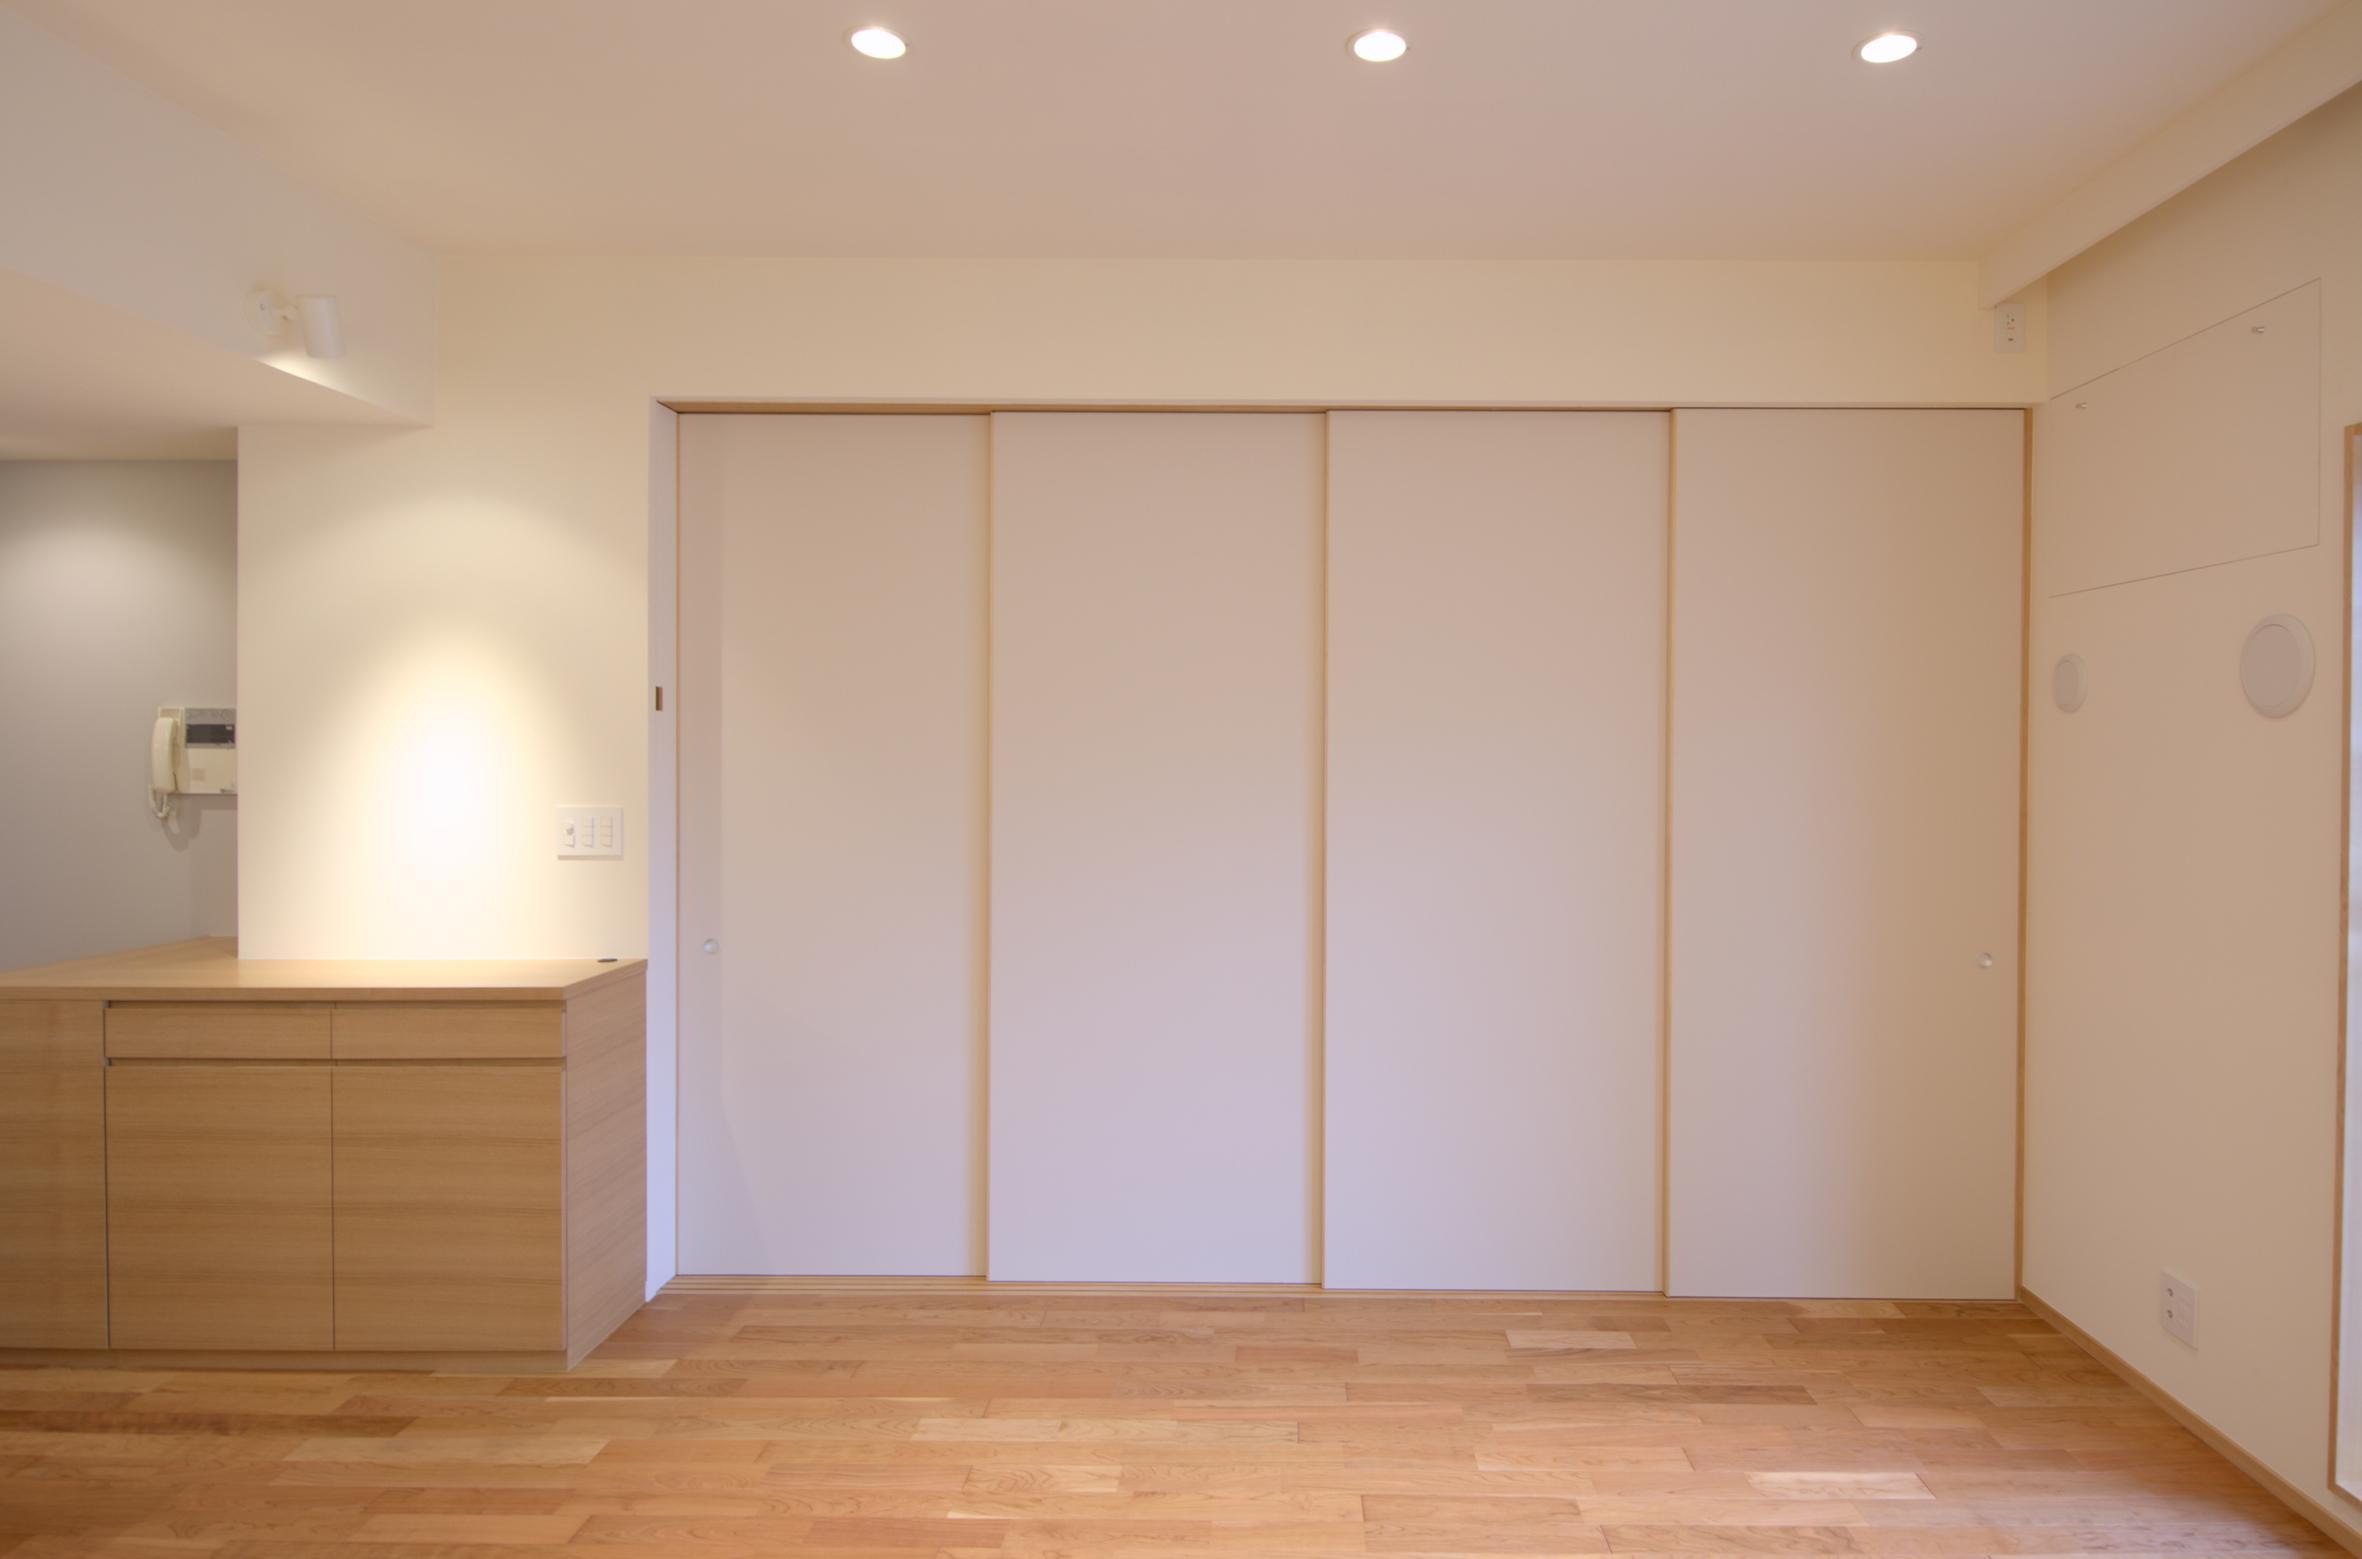 Oさんの大好きなものが集まる大切な場所の部屋 和室を間仕切る襖